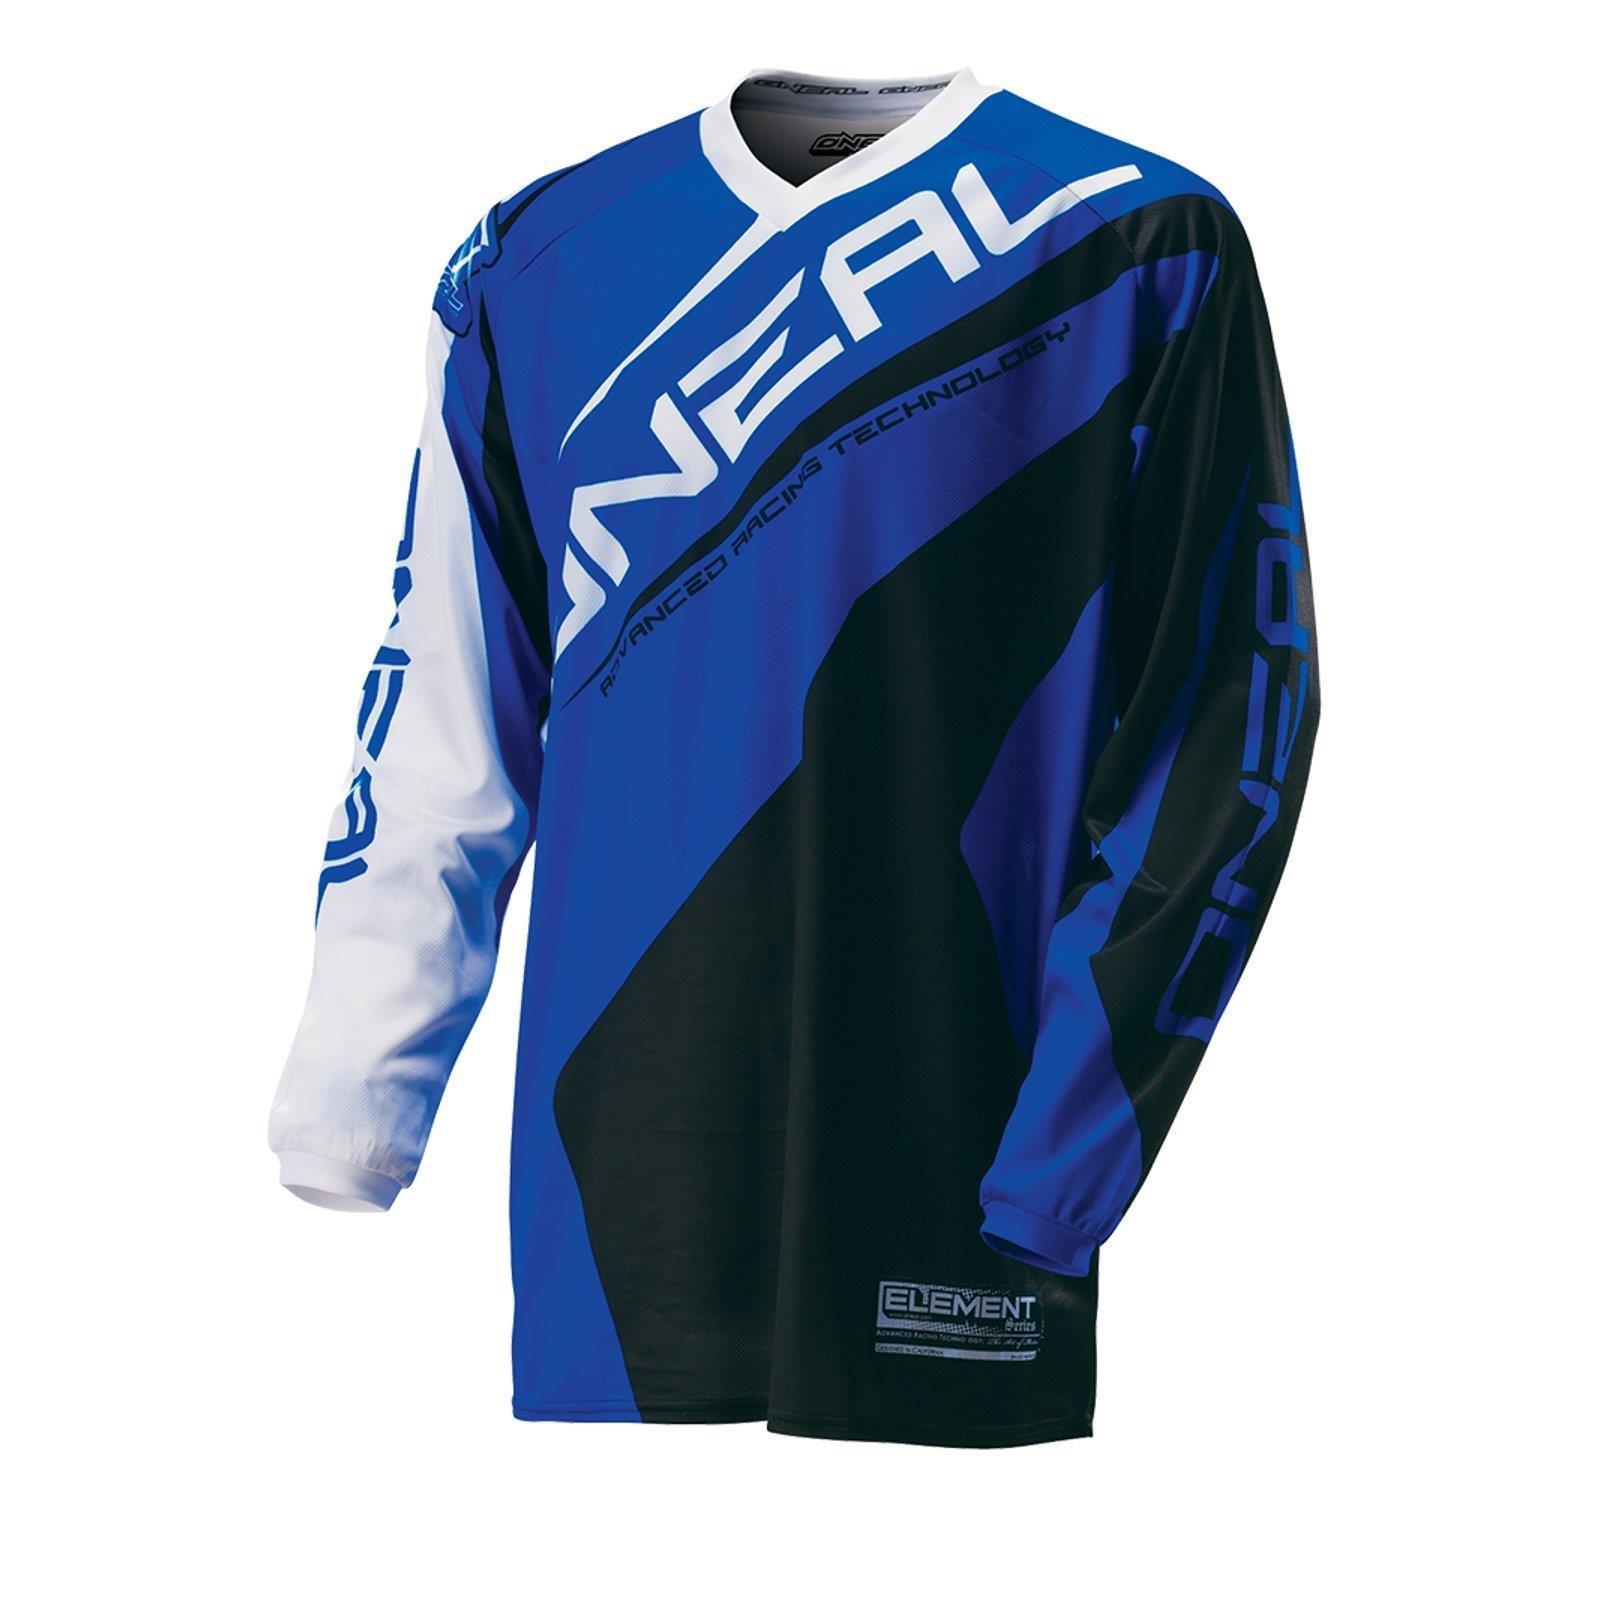 O-039-Neal-elemento-Mayhem-JERSEY-Racewear-Motocross-Maglia-MX-DH-FR-MTB-MOUNTAIN-BIKE miniatura 105